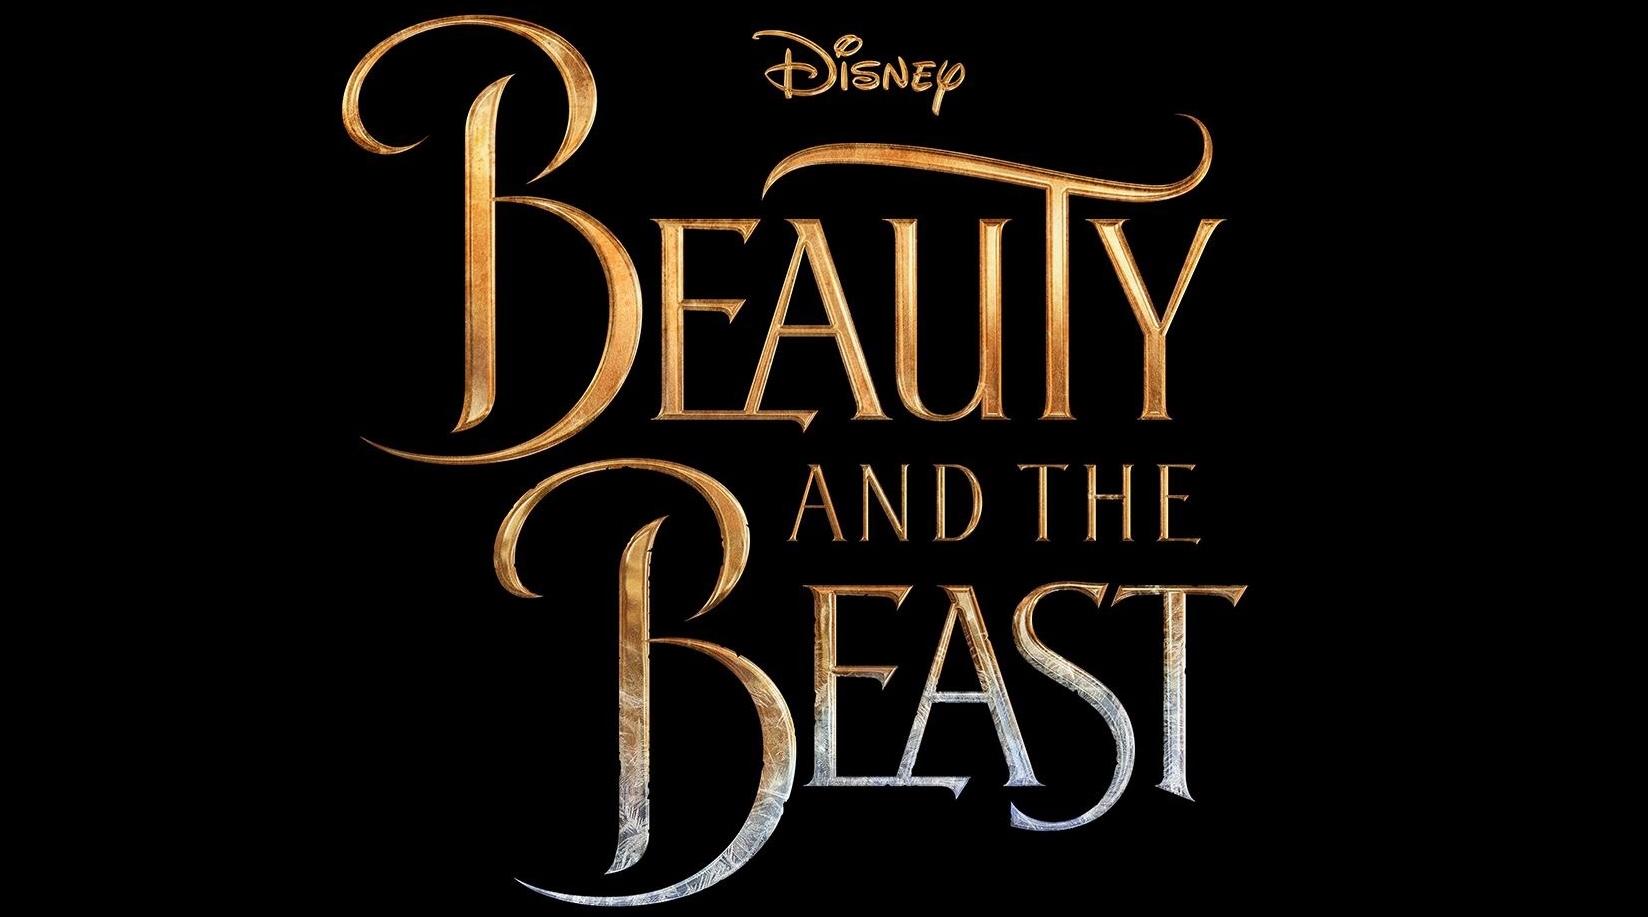 Image - Beauty and the Beast revealed 2017 logo.jpg